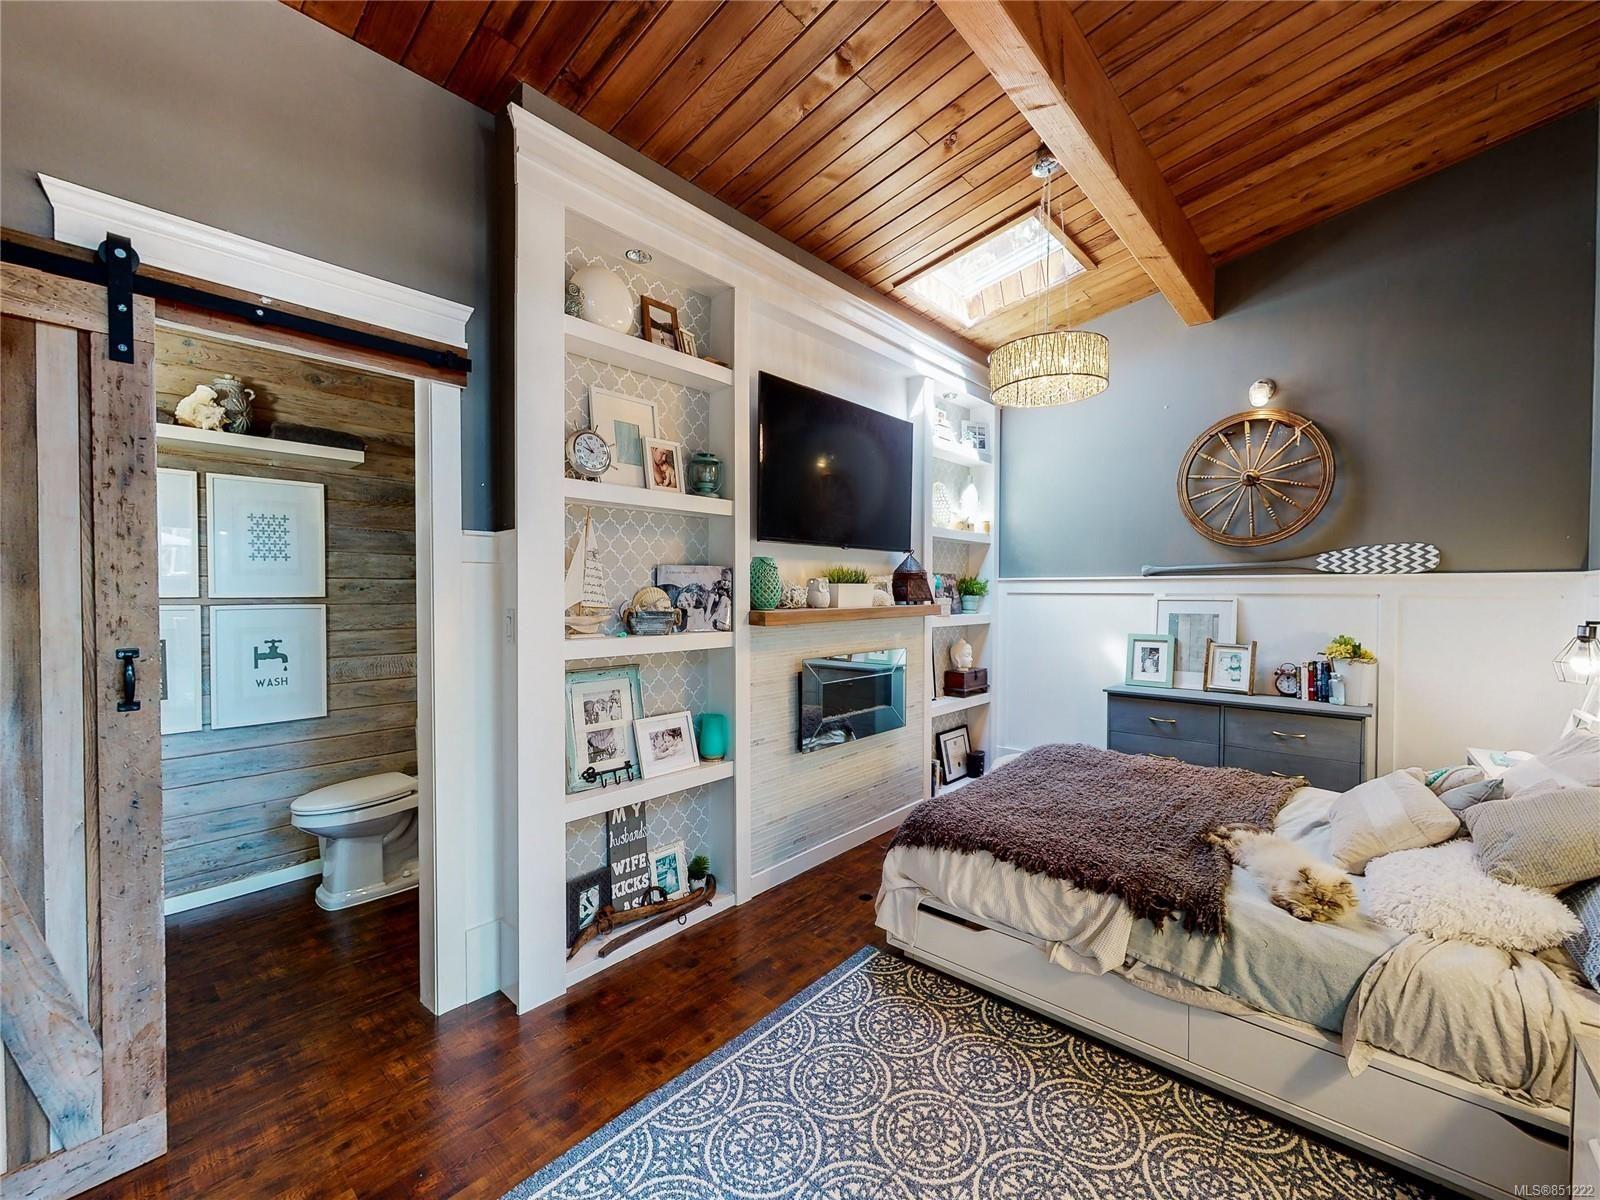 Photo 13: Photos: 2525 11th Ave in : PA Port Alberni House for sale (Port Alberni)  : MLS®# 851222